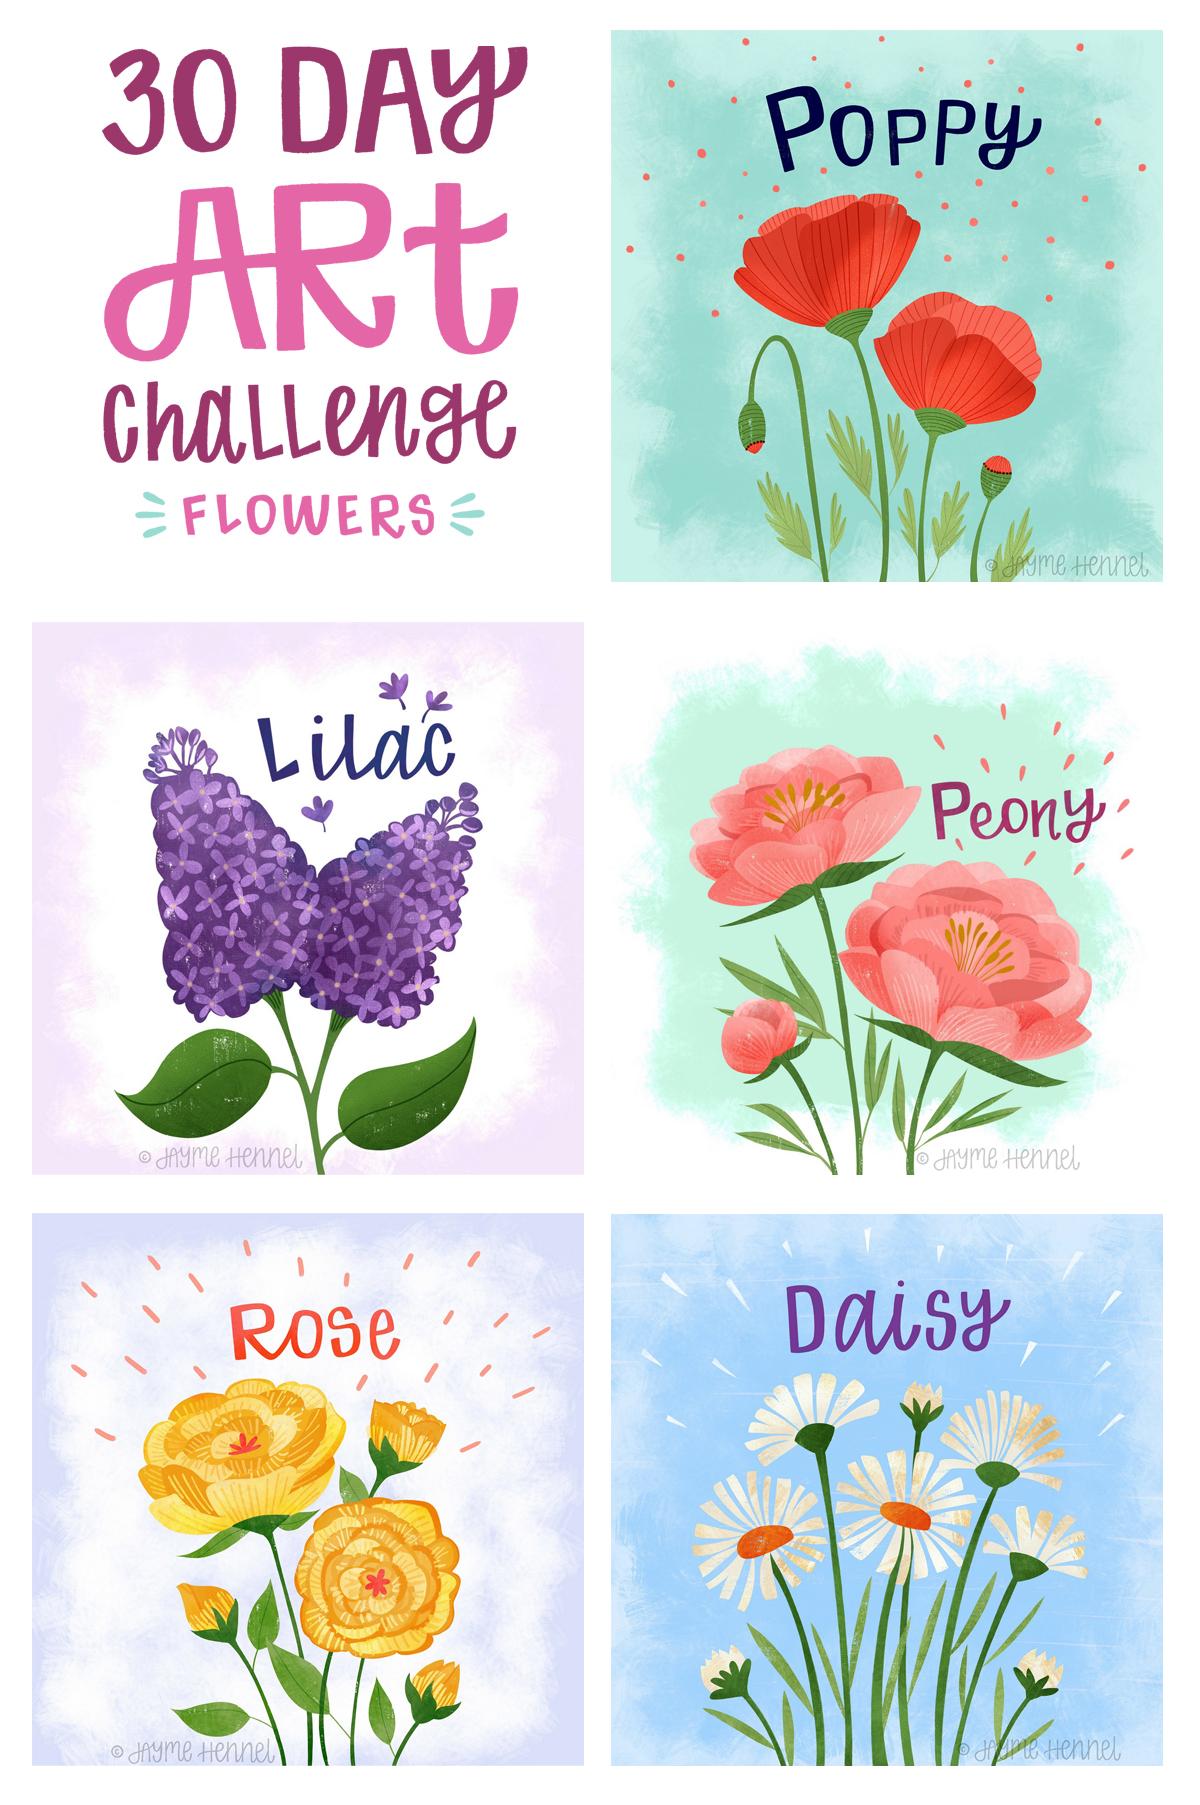 ©2017 Jayme Hennel - flowers art challenge 1-5.jpg